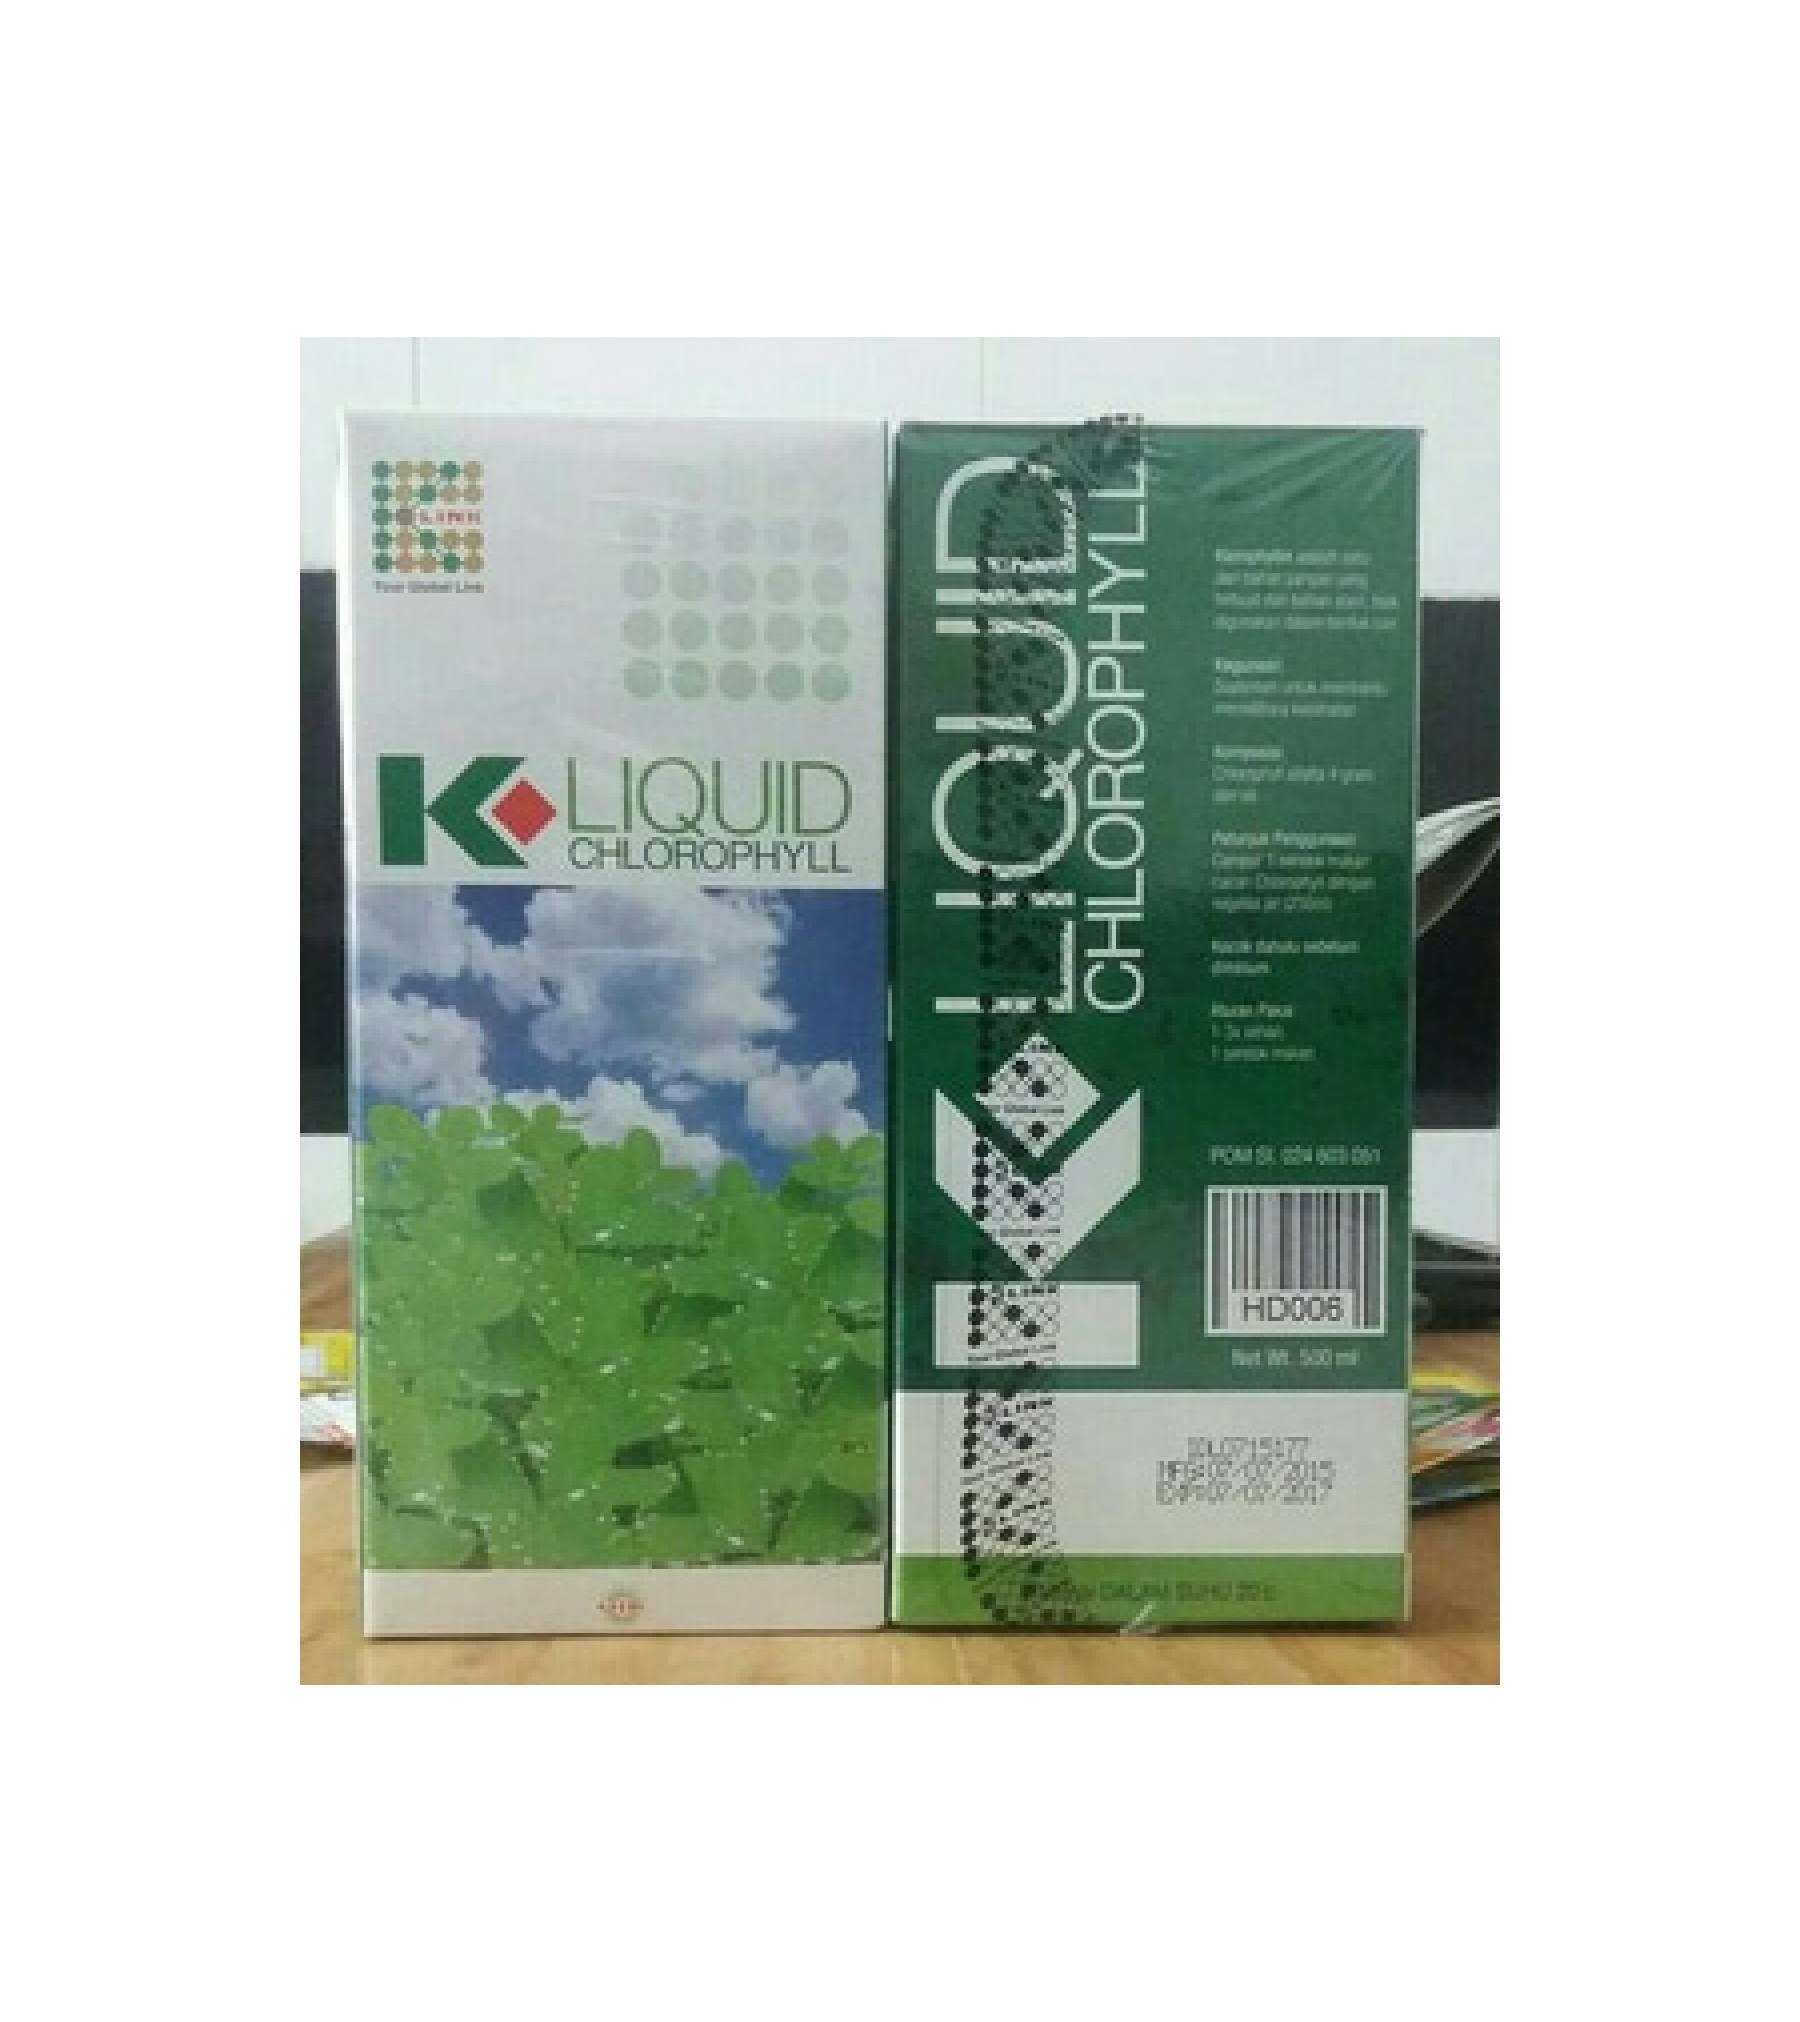 Kliniksunnah K Link Klorofil Liquid Chlorophyll 500 Ml Daftar Klink 500ml Clorophyl